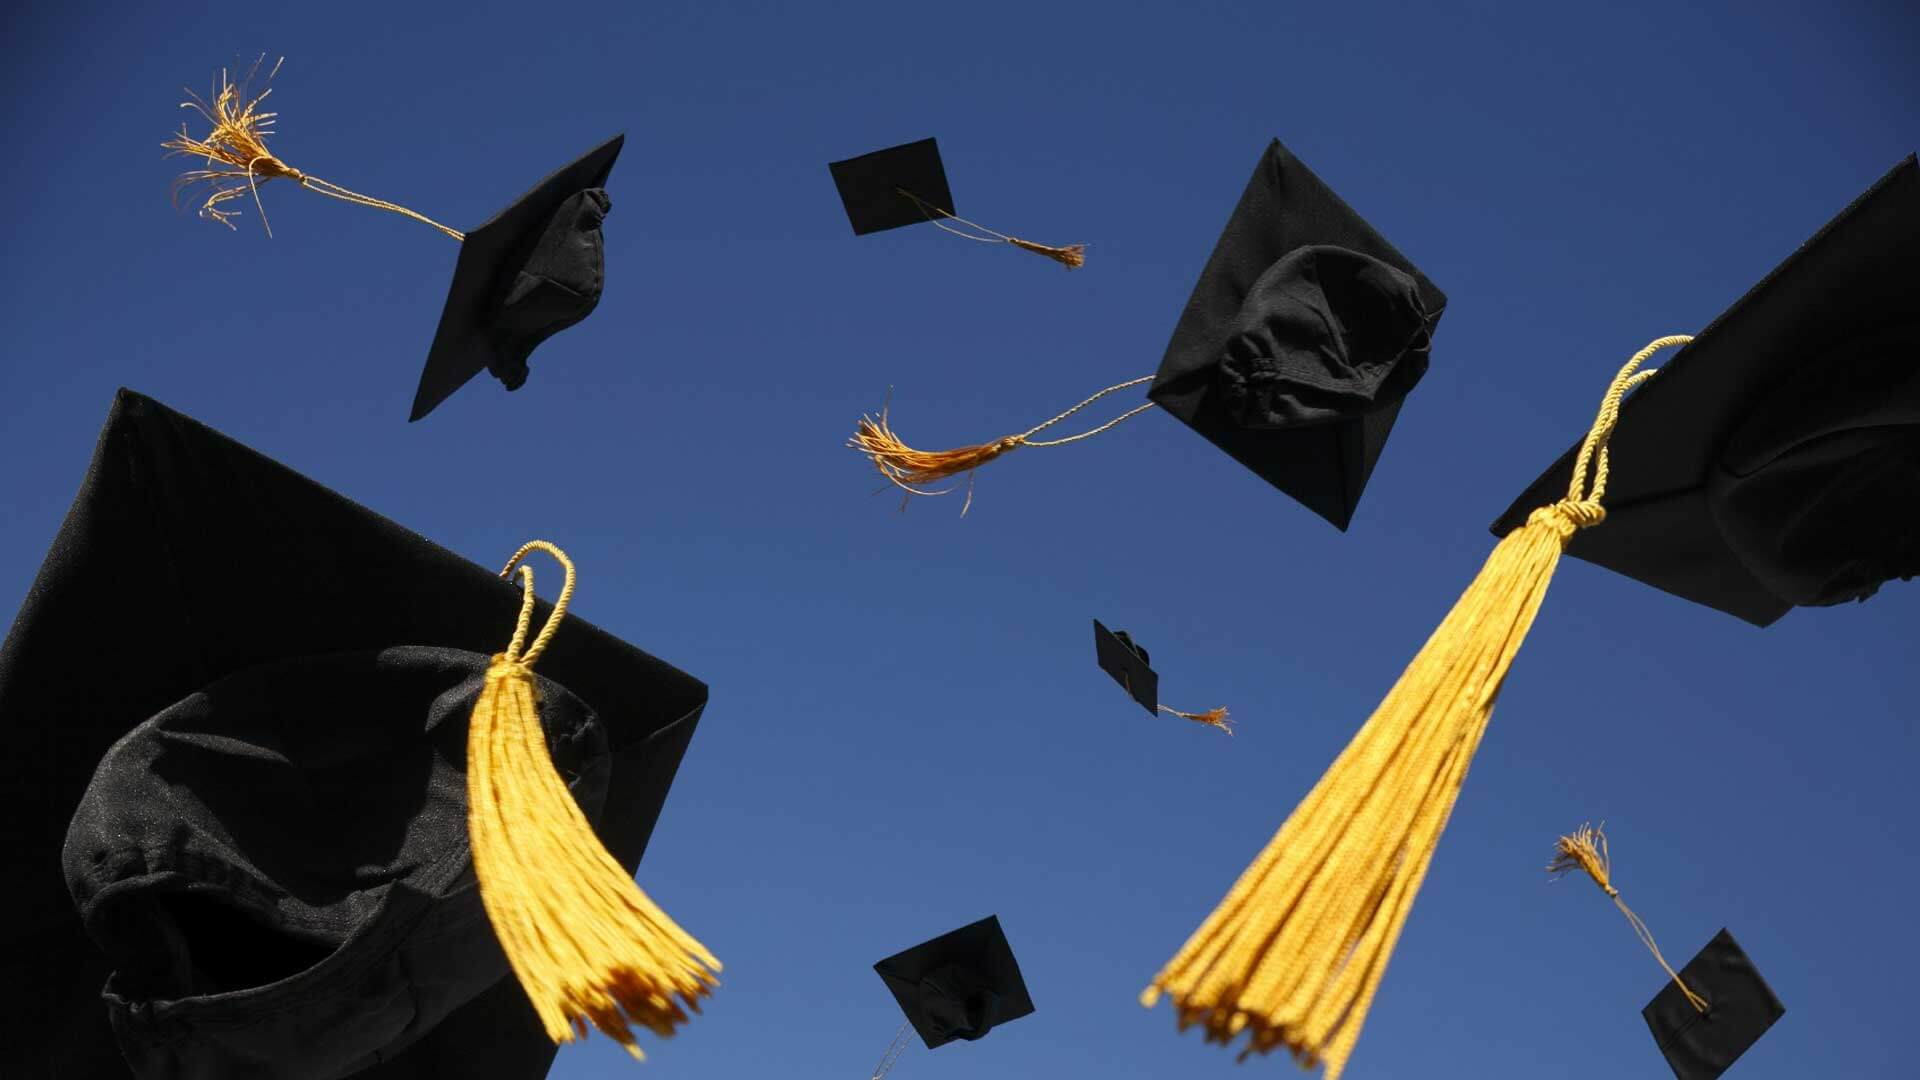 Global Career Opportunities in the Academics Industry